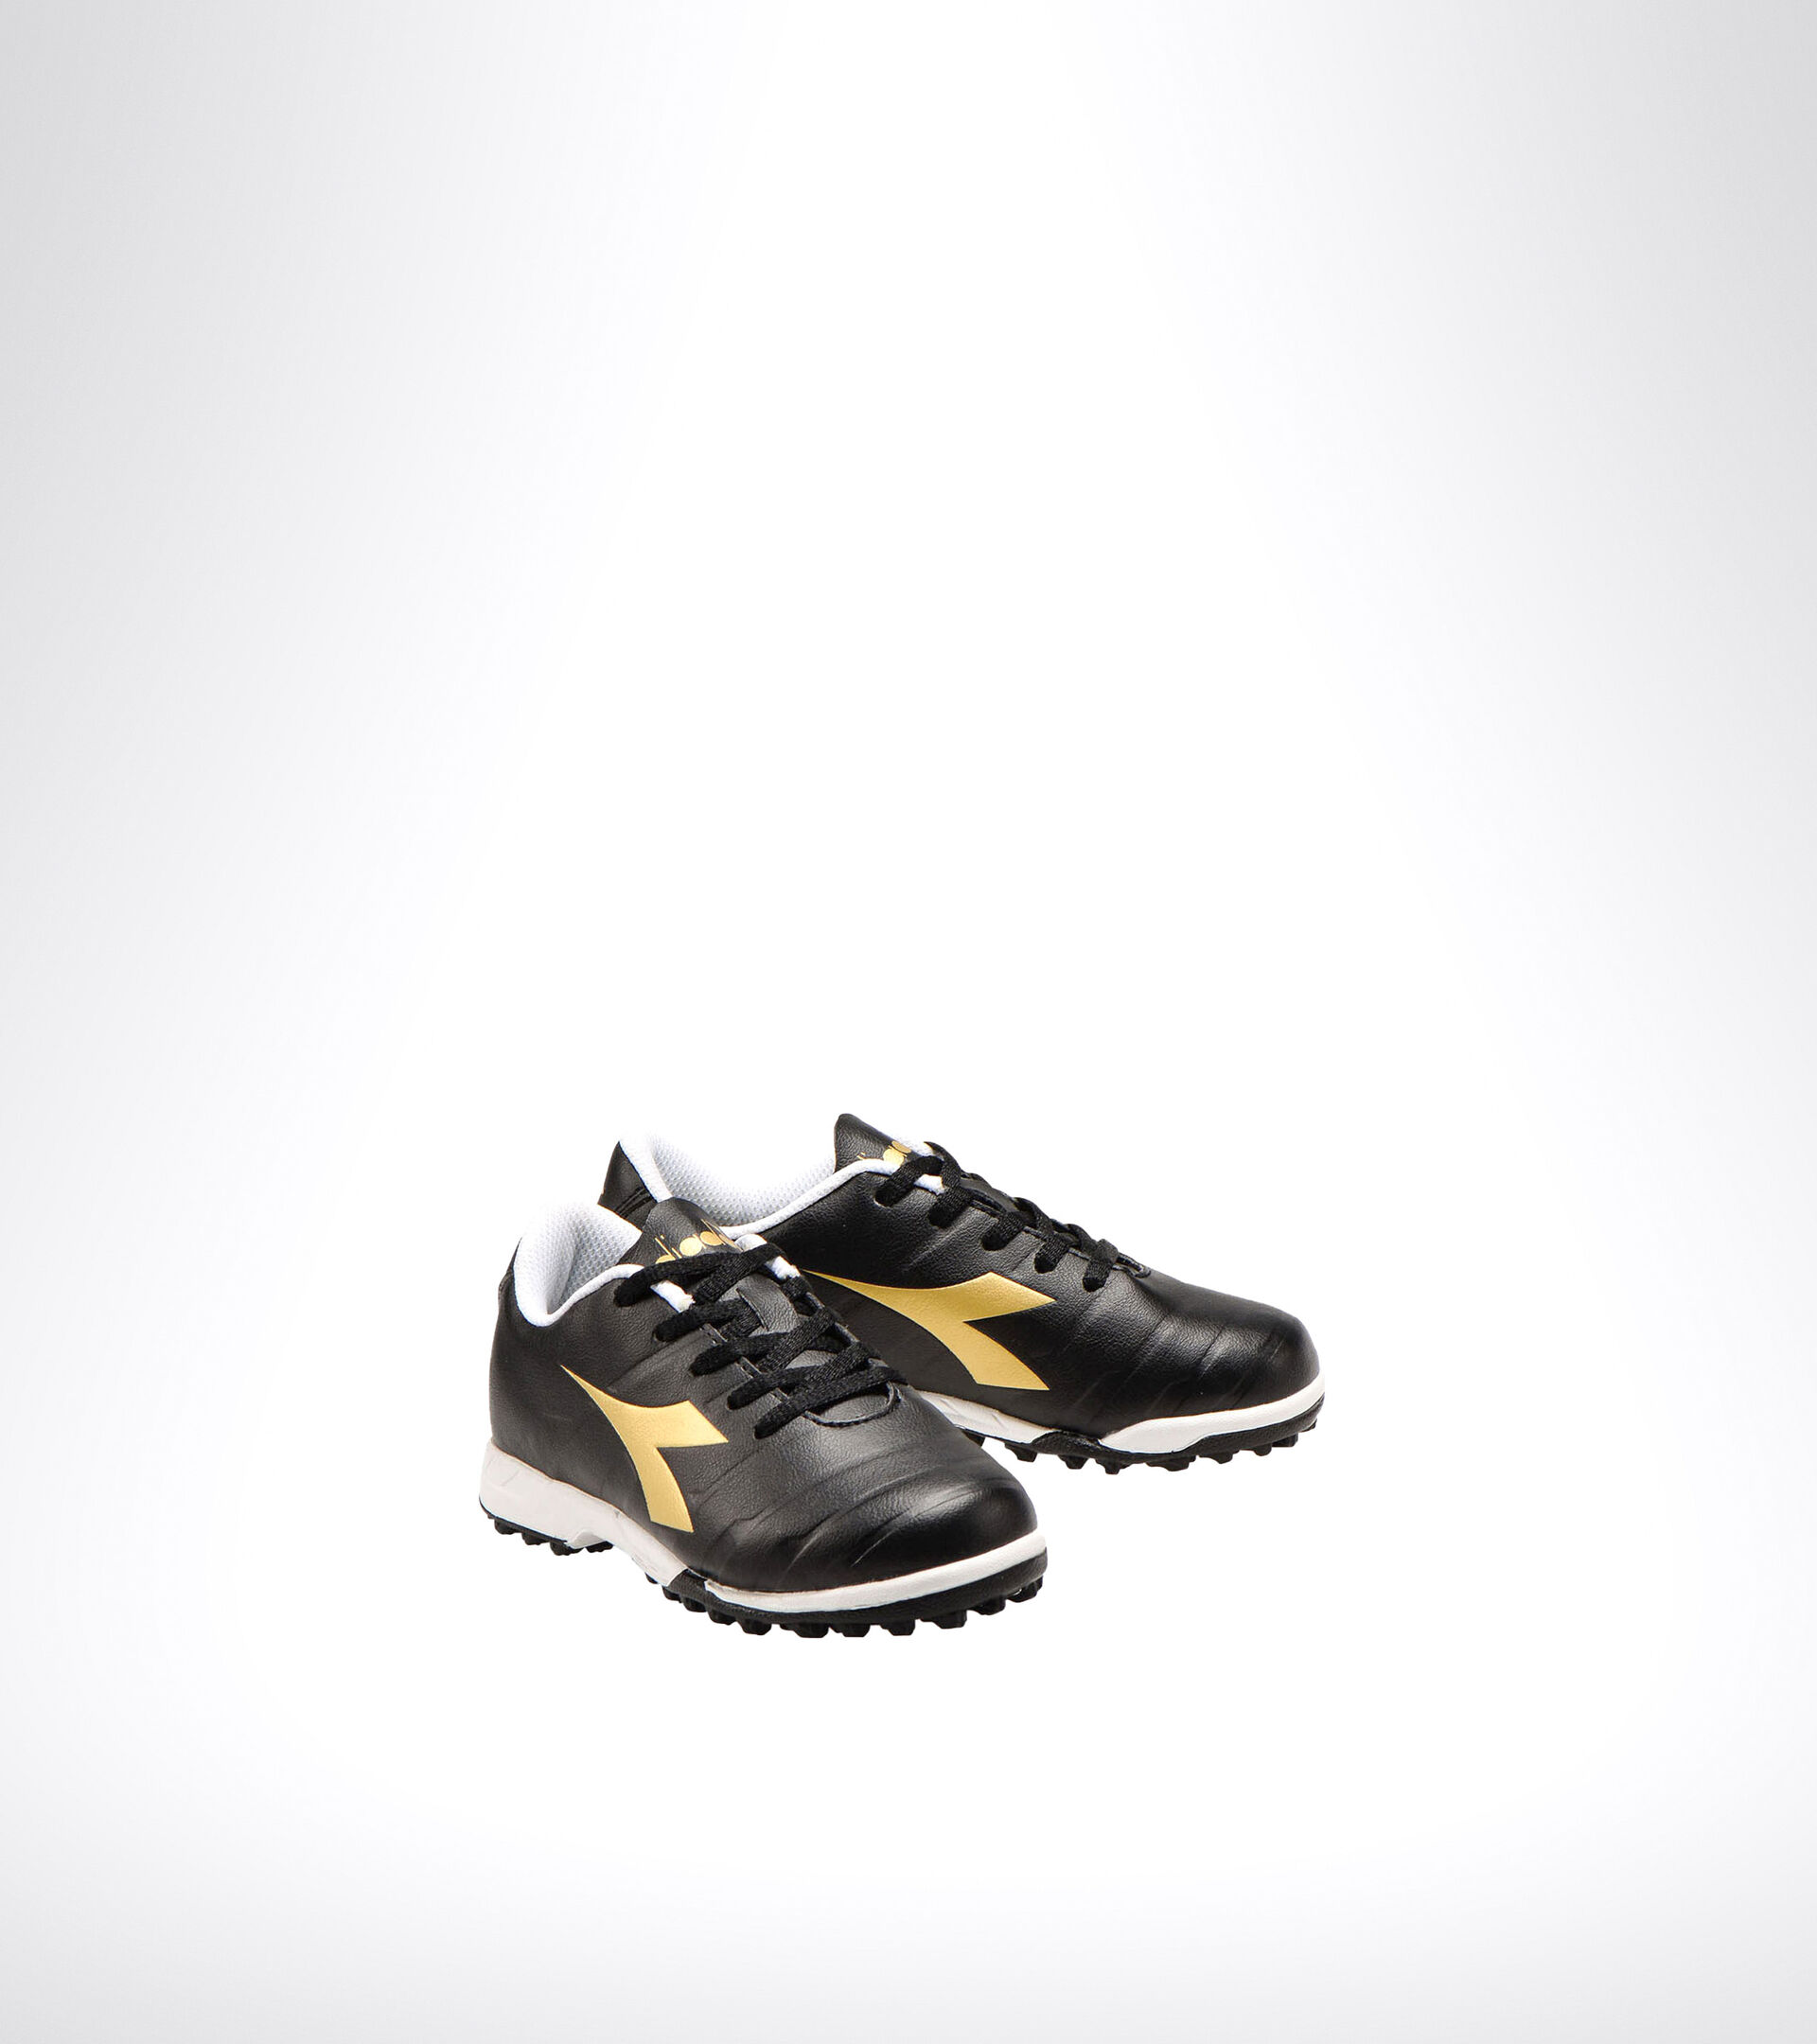 Footwear Sport BAMBINO PICHICHI 3 TF JR NEGRO/BLANCO/ORO MARRON Diadora